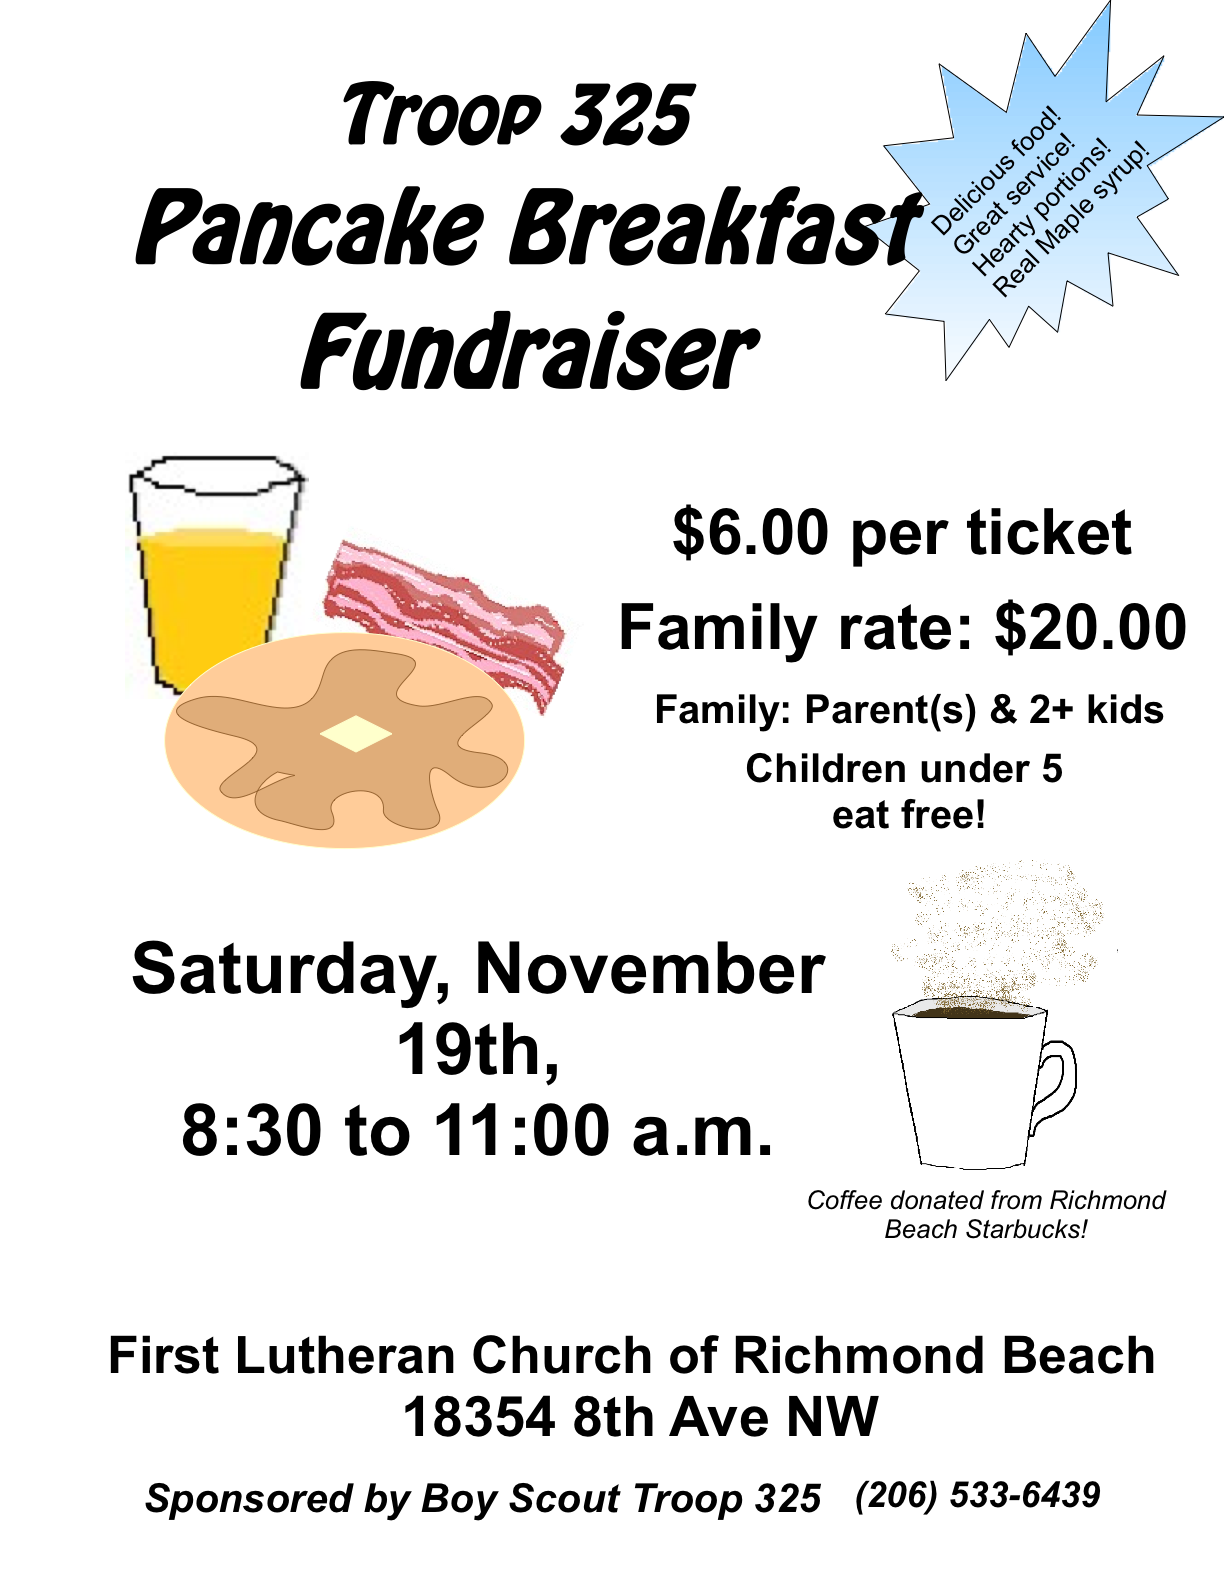 pancake breakfast fundraiser flyer template – Fundraiser Flyer Template